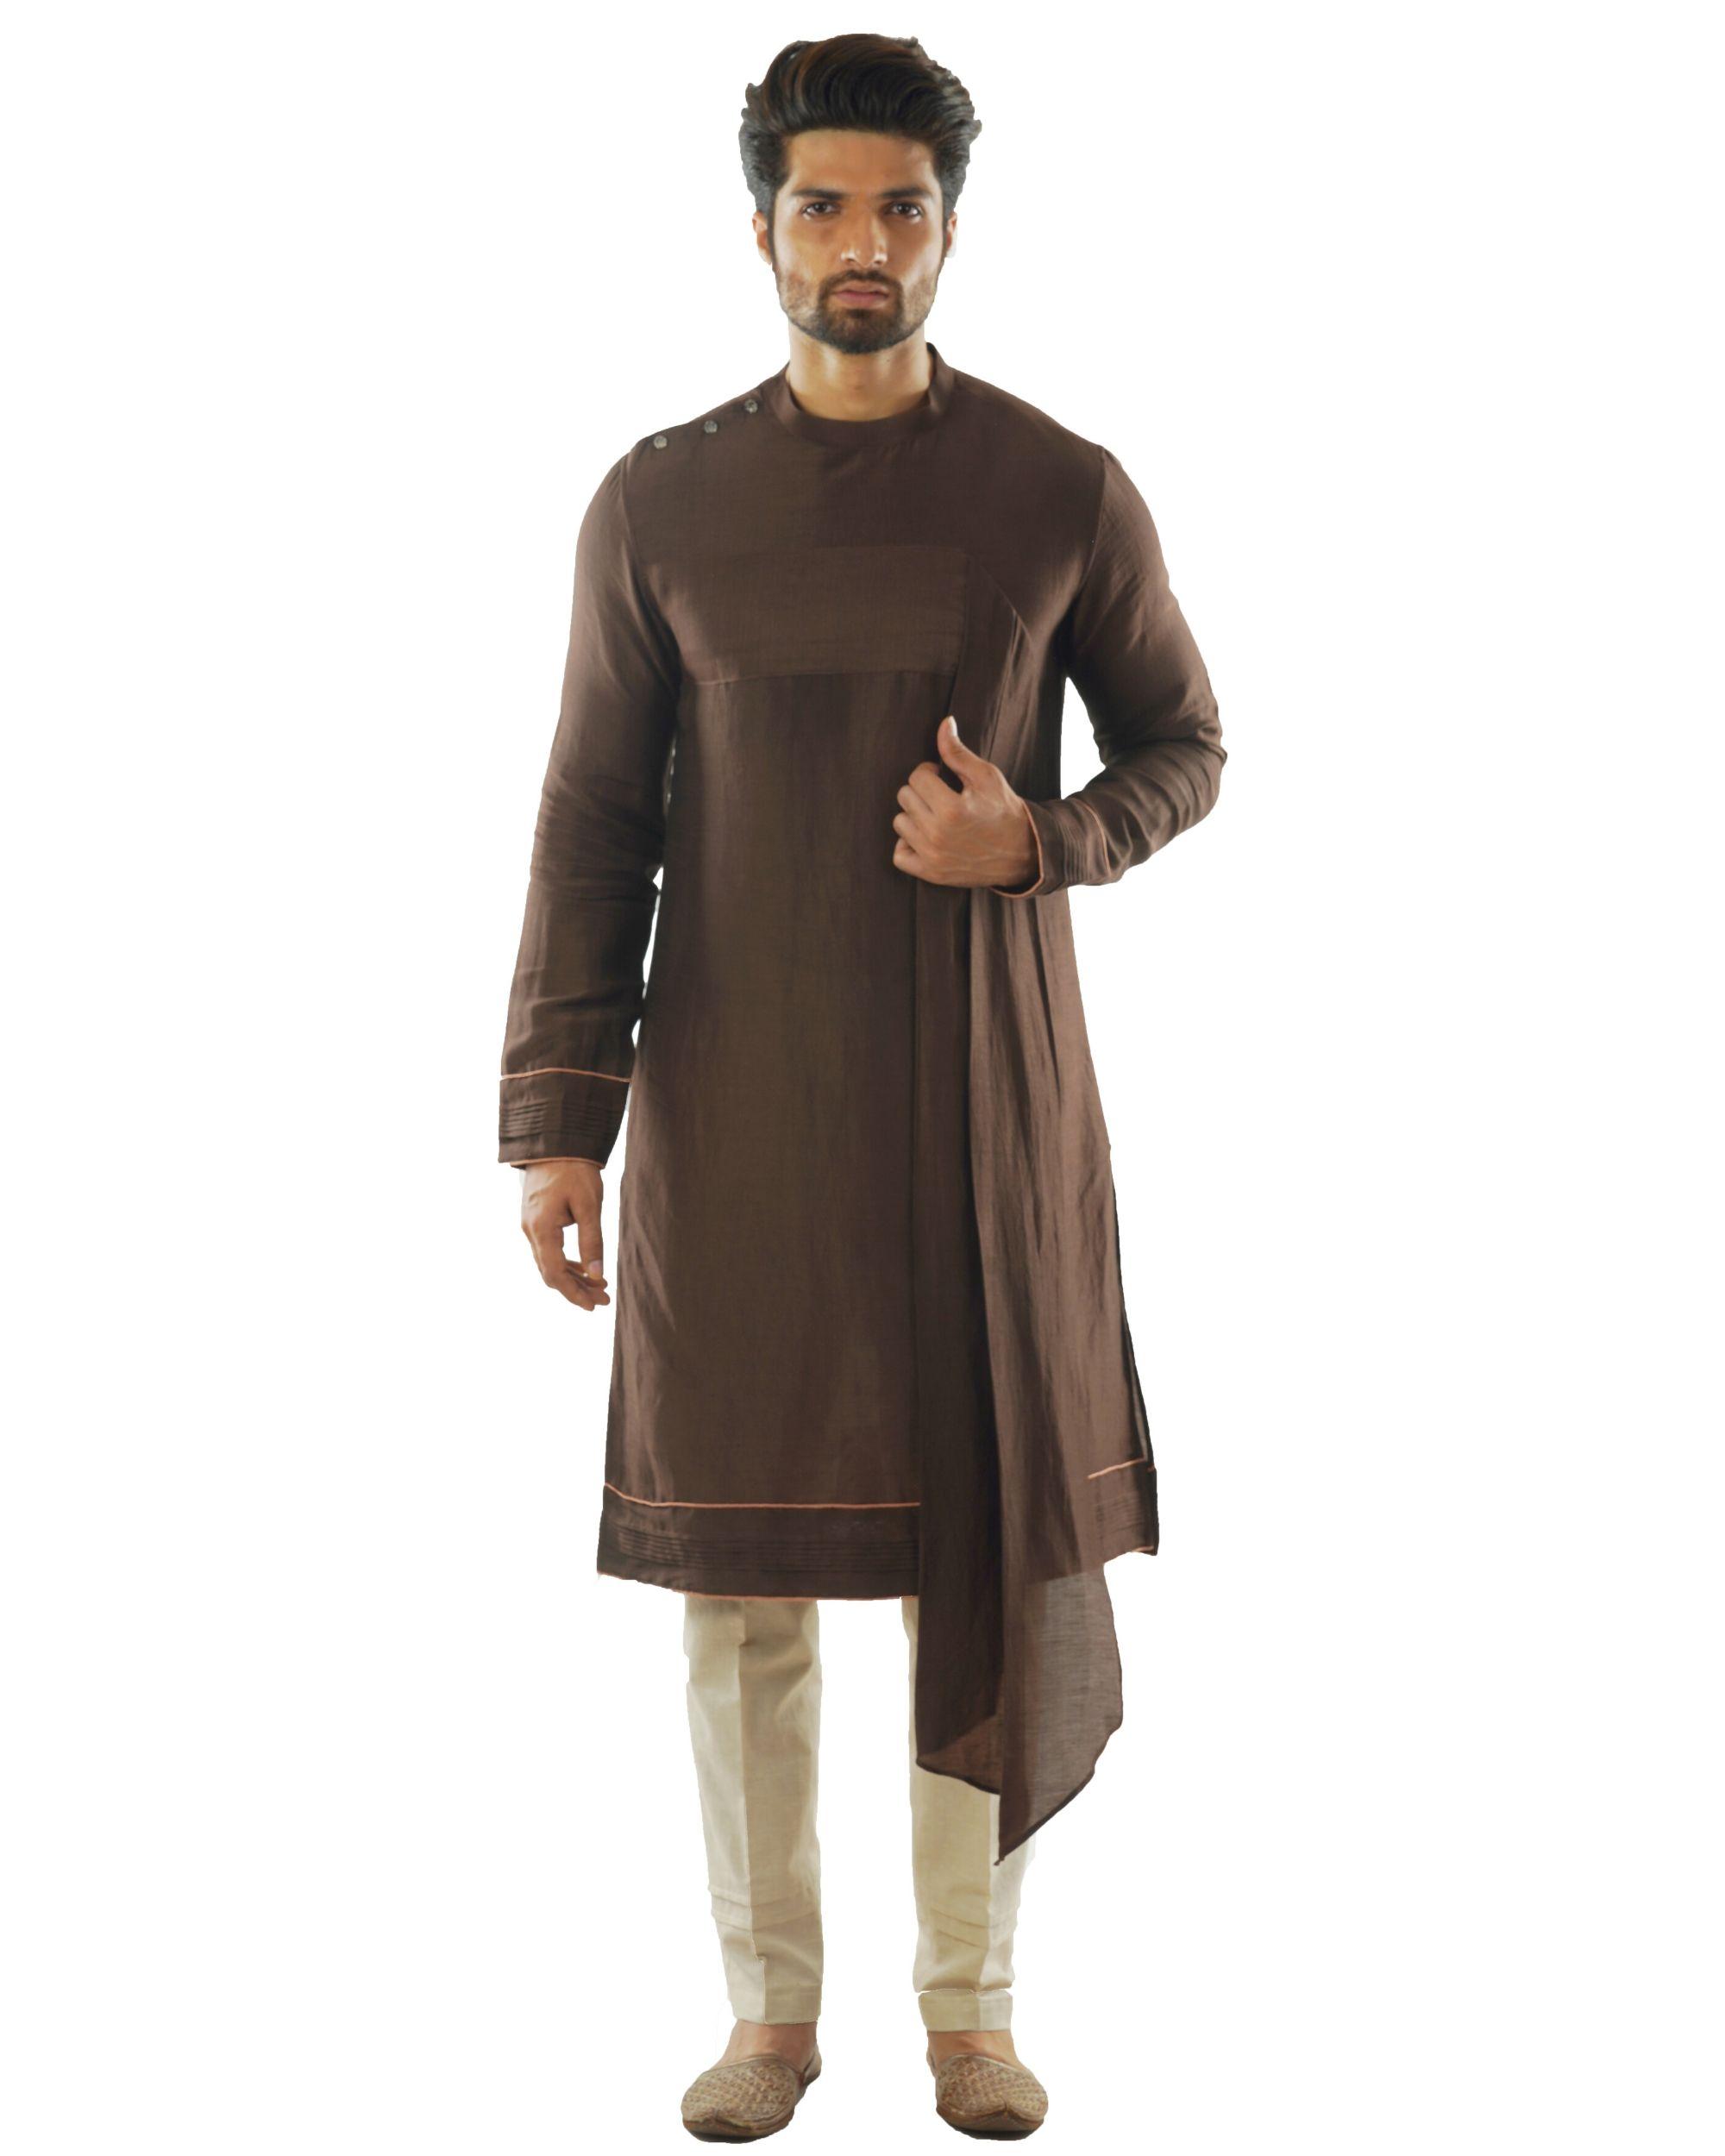 Soil brown kurta with dupatta drape and pin tuck pants set- Set Of Two